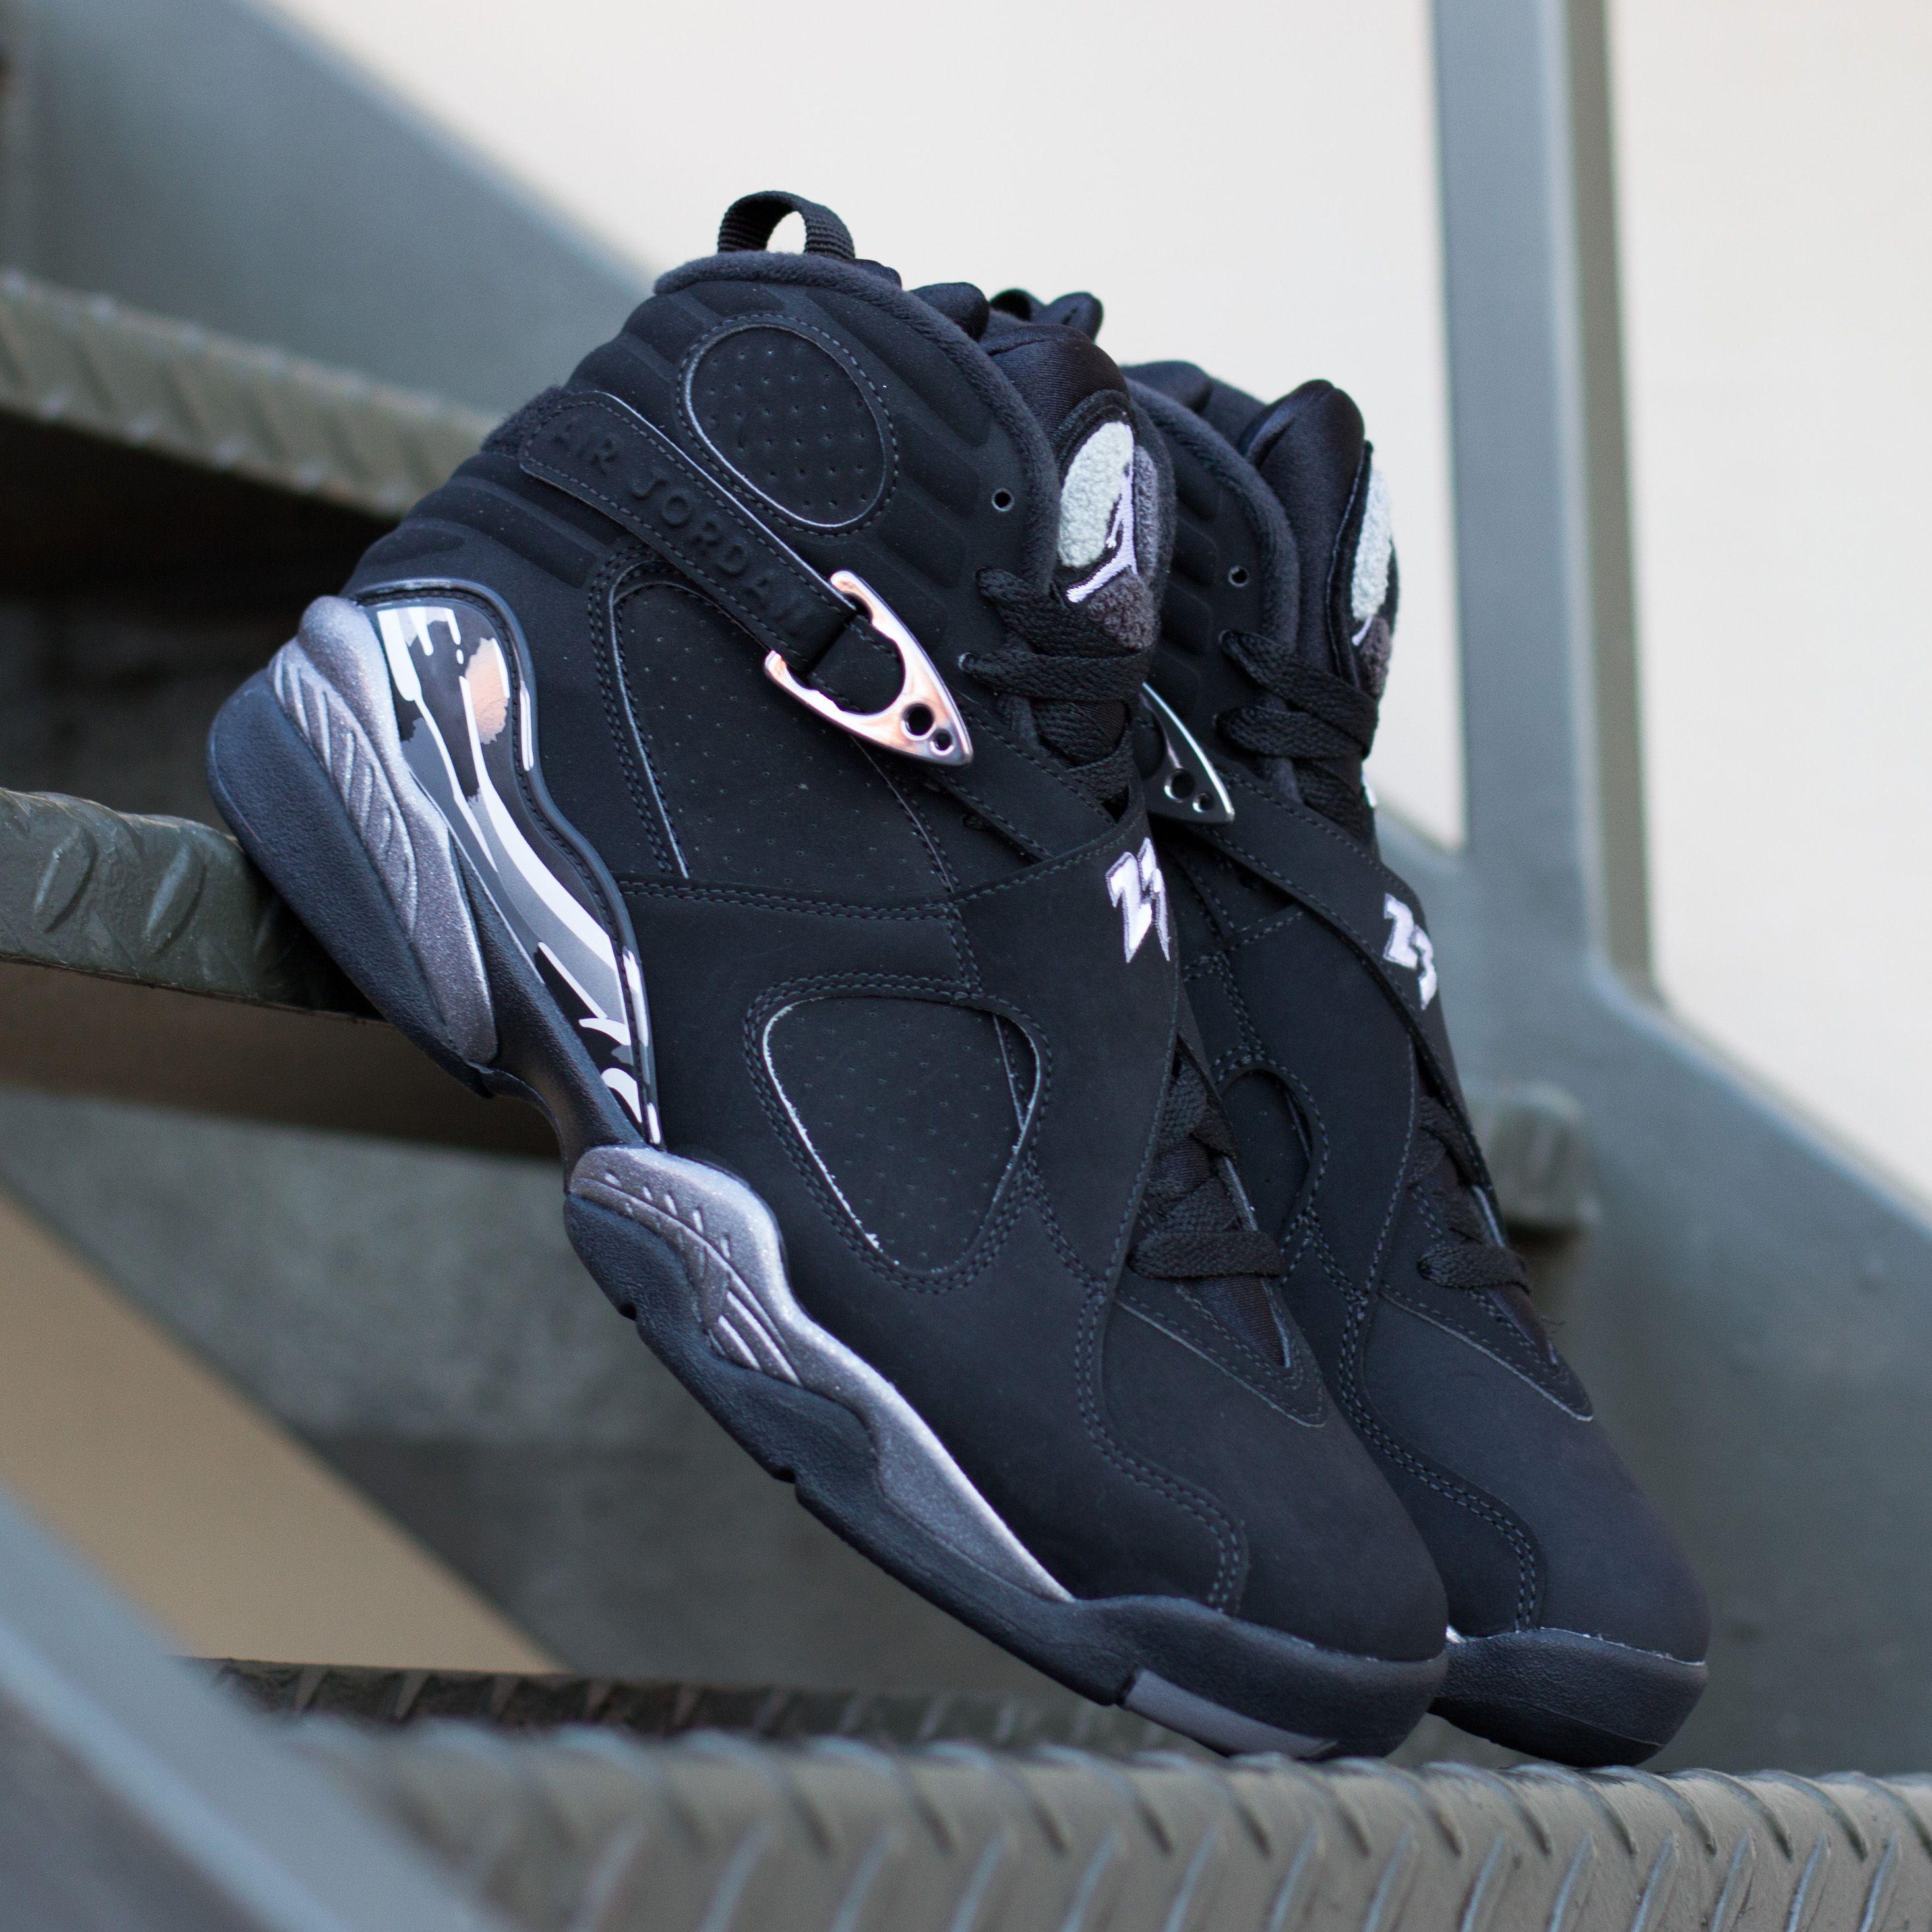 Air jordans, Men's shoes, Sneakers nike